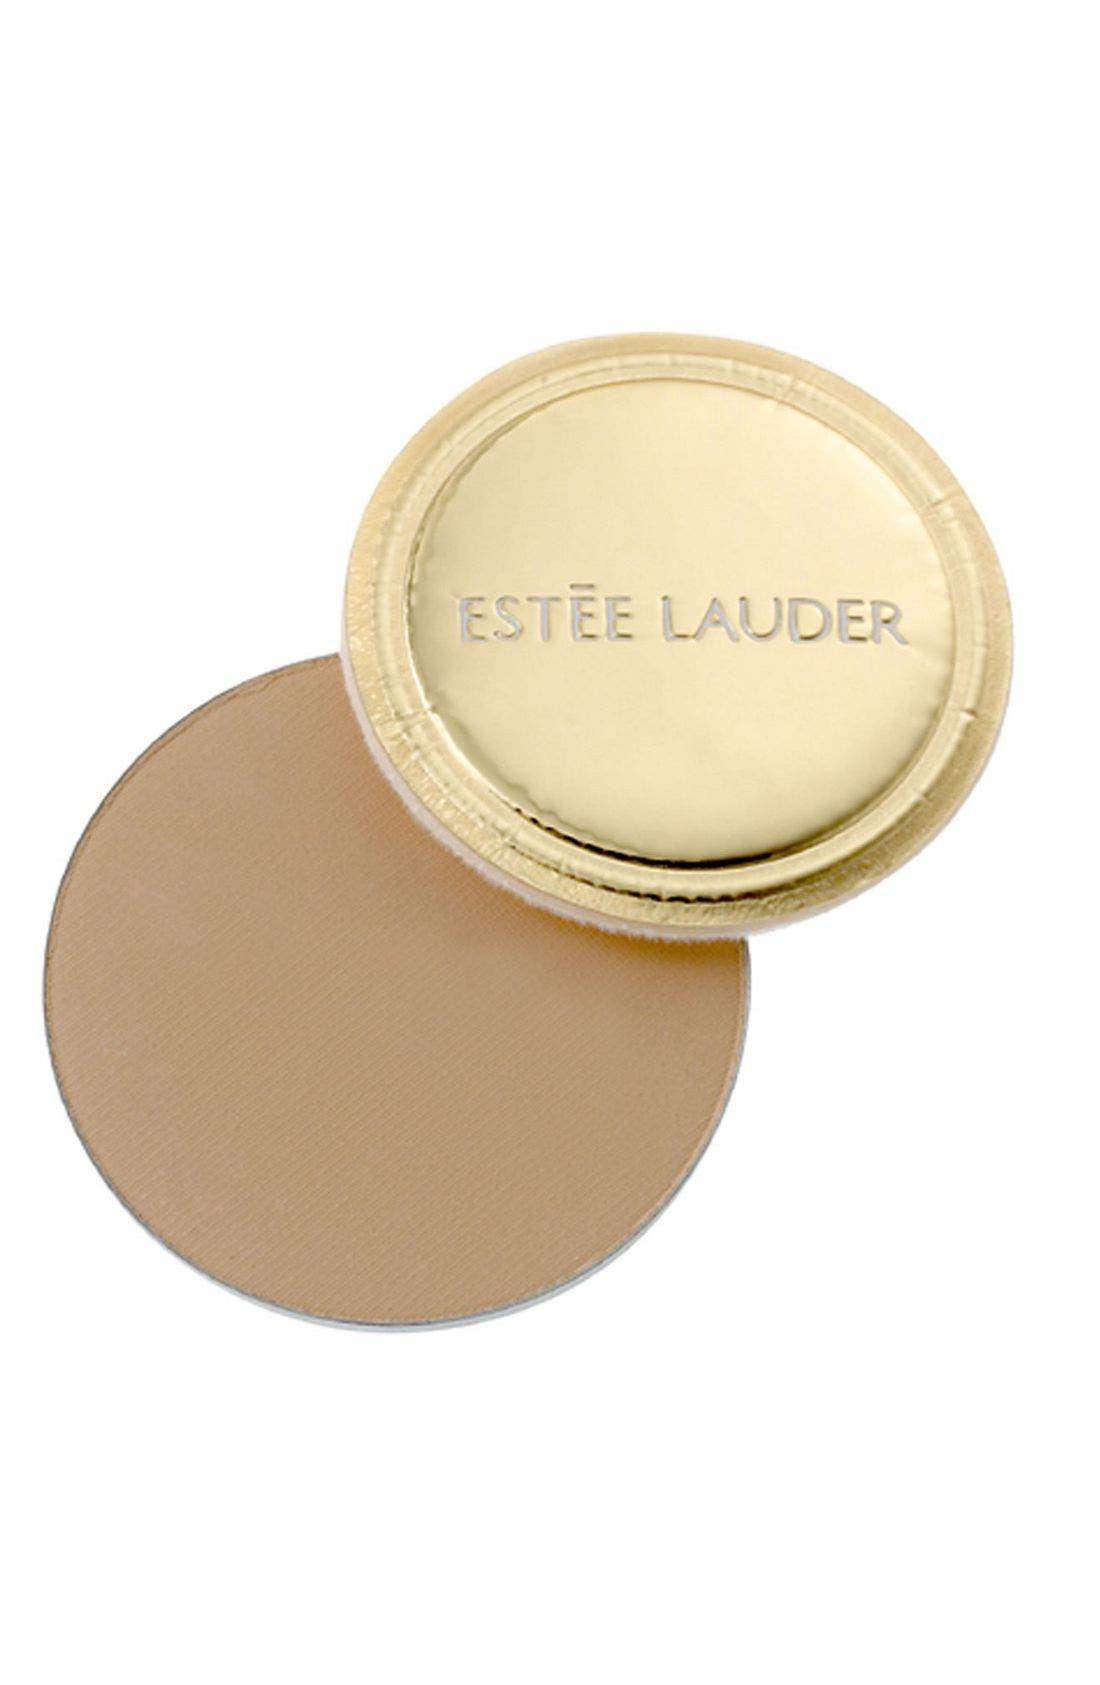 Alternate Image 1 Selected - Estée Lauder 'After Hours' Lucidity Pressed Powder Refill